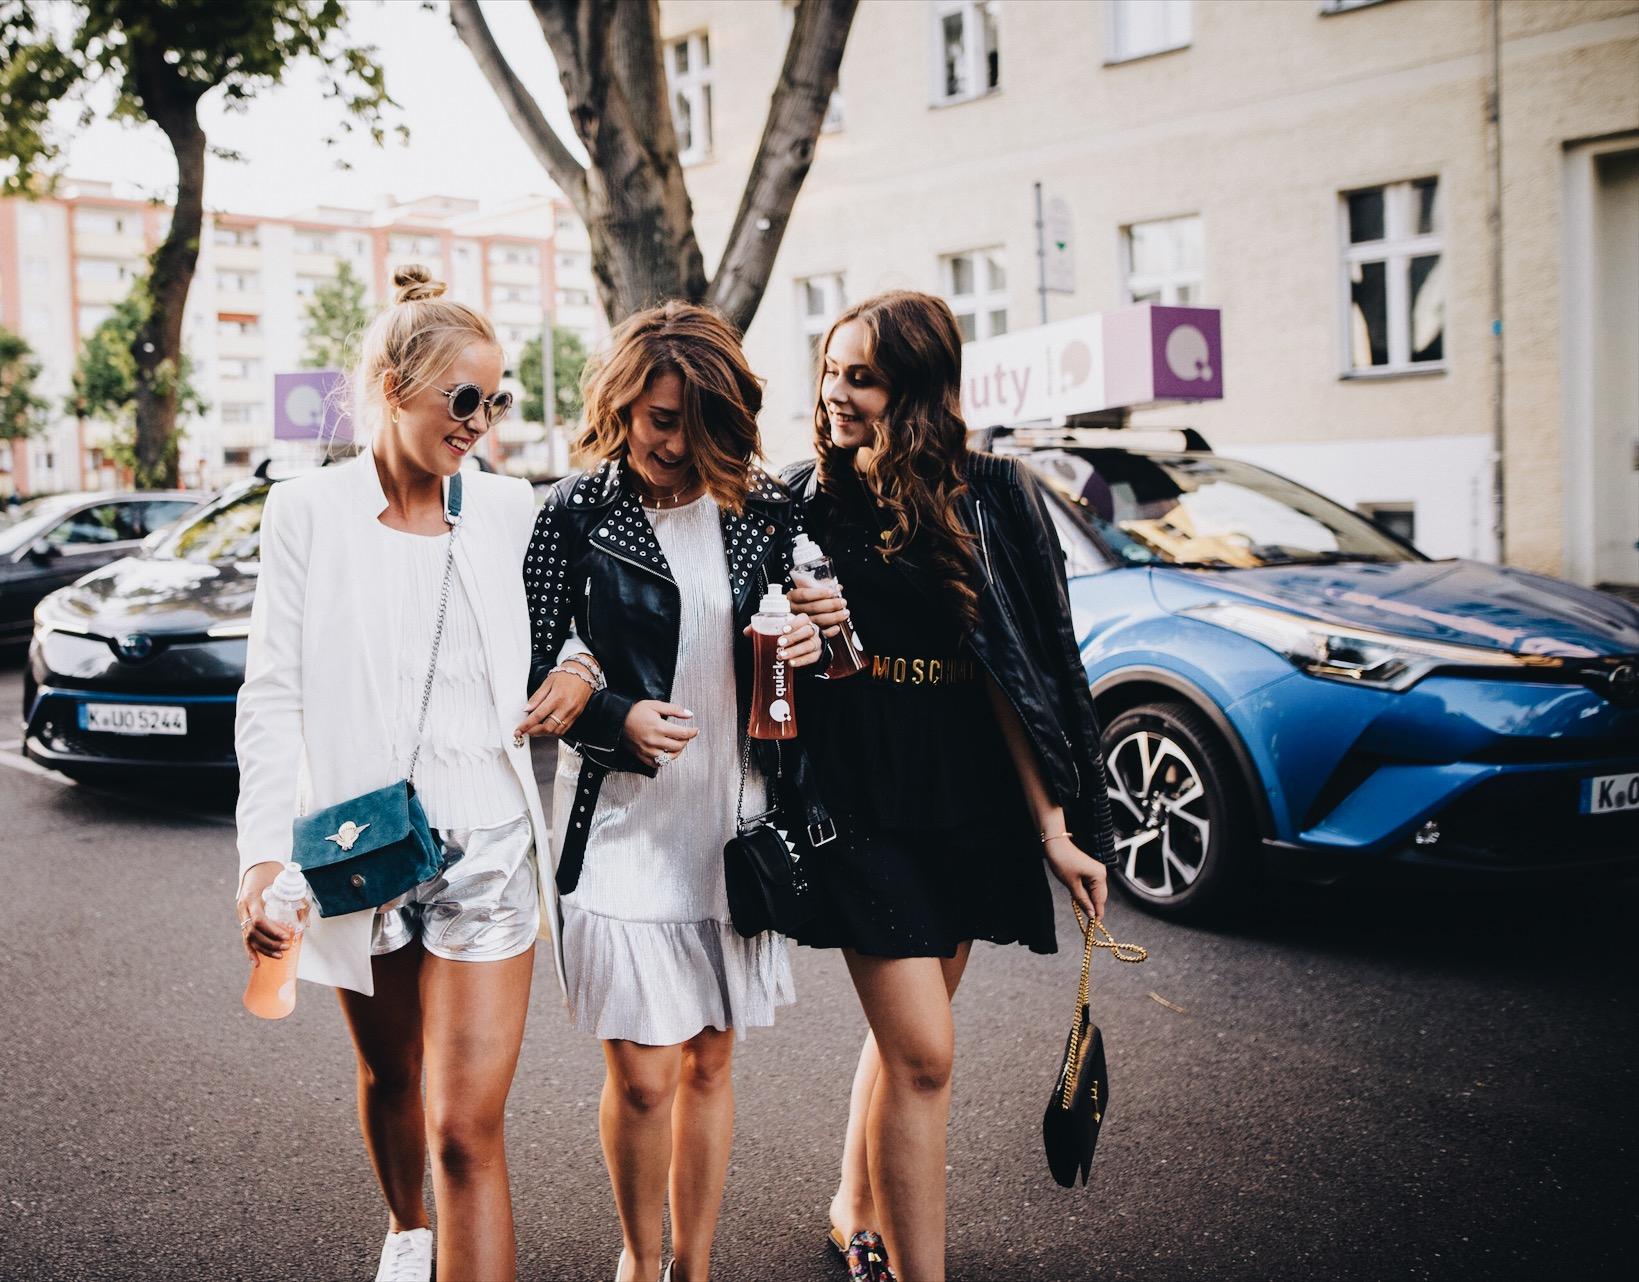 allthatchoices by laura fashionblog mainz frankfurt fashion week berlin quickcap reichert plus toyota chr fewo direkt